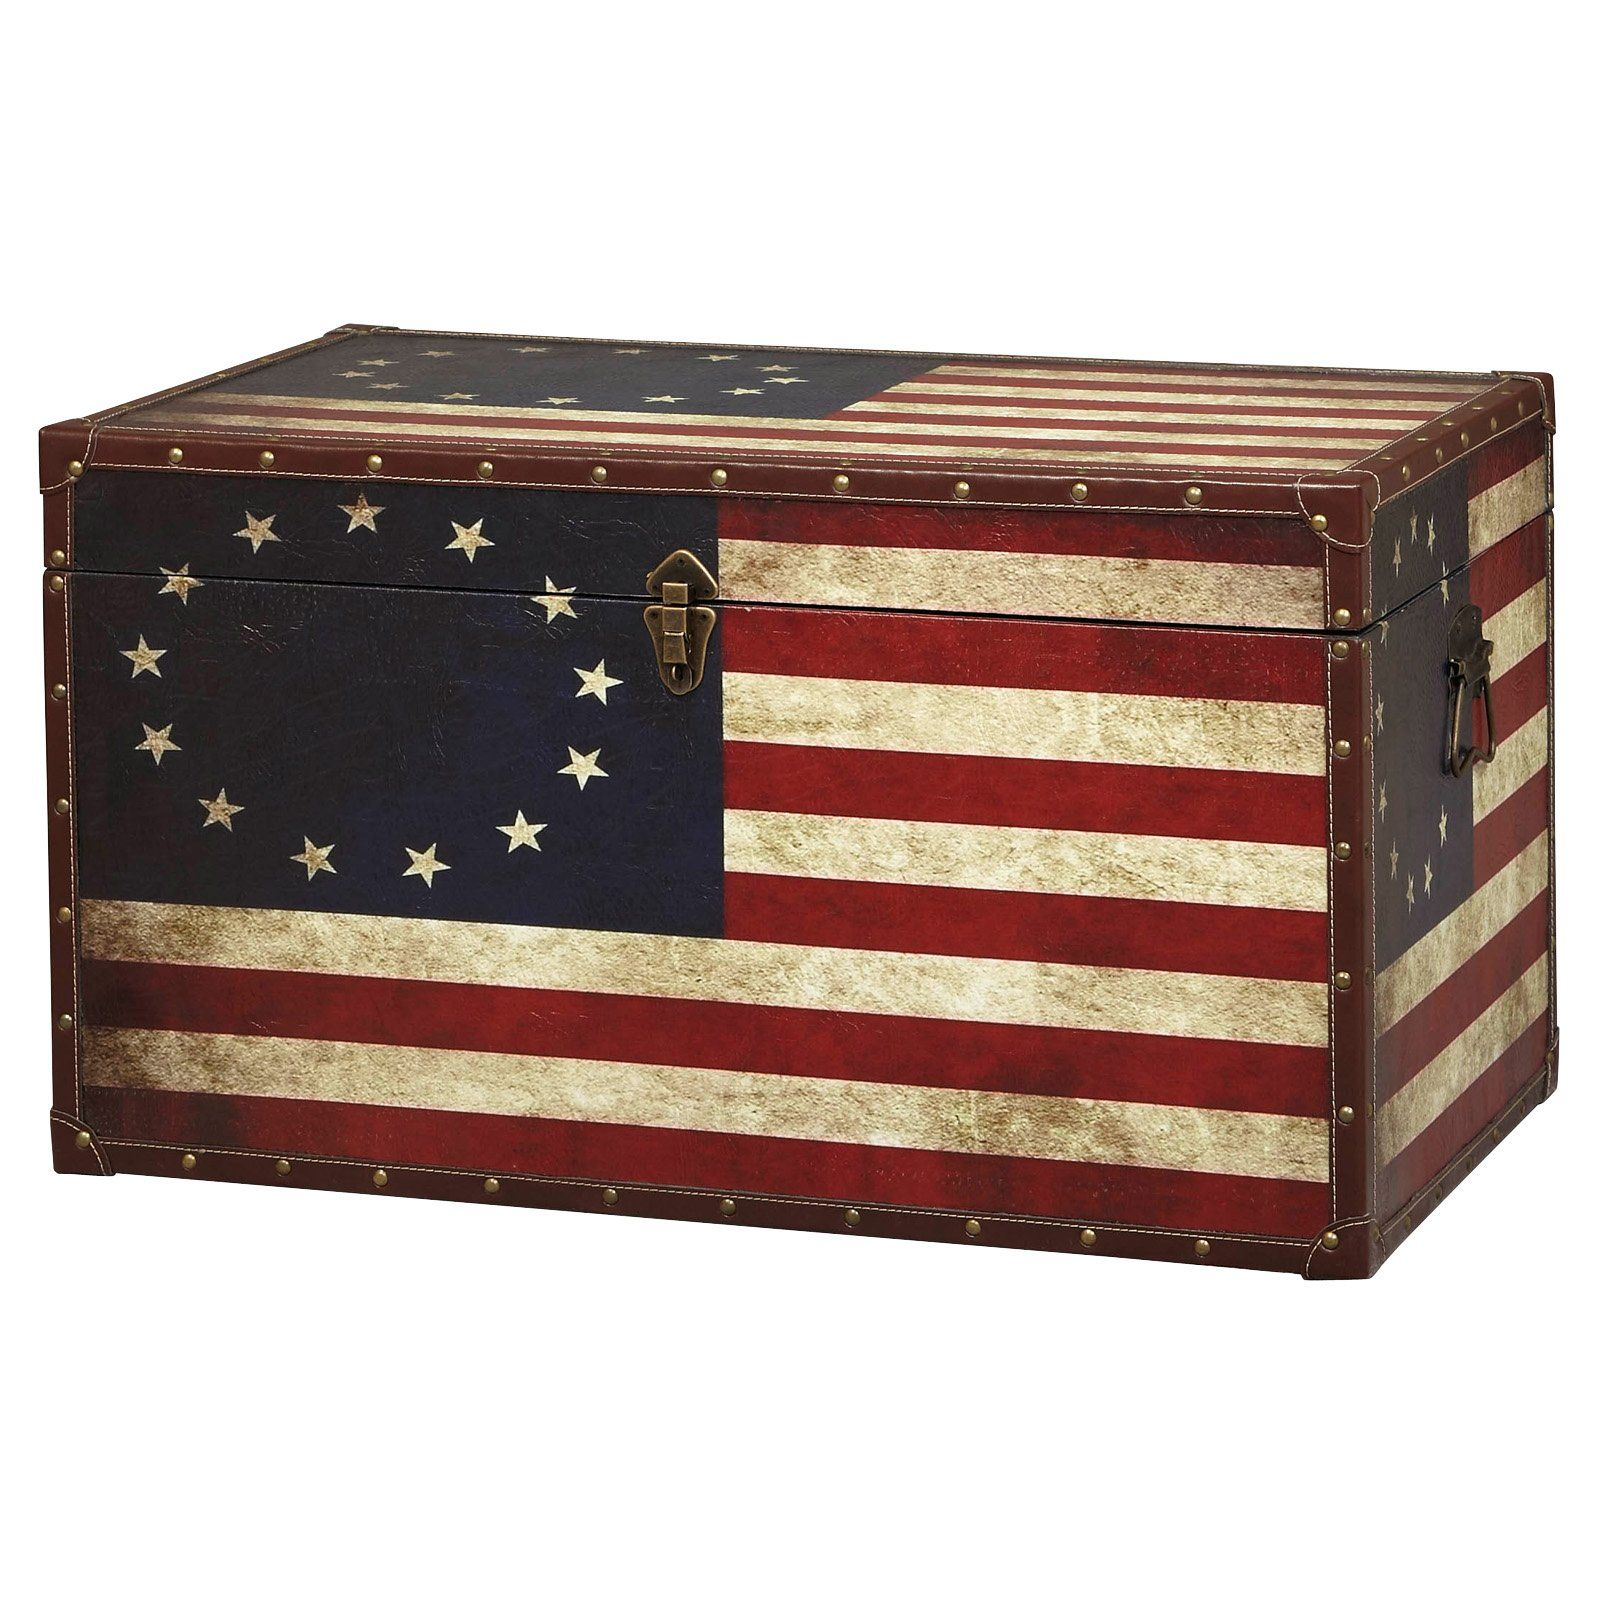 Vintage American Flag Coffee Table Trunk  sc 1 st  Pinterest & Vintage American Flag Coffee Table Trunk | Furniture Refurbs ...